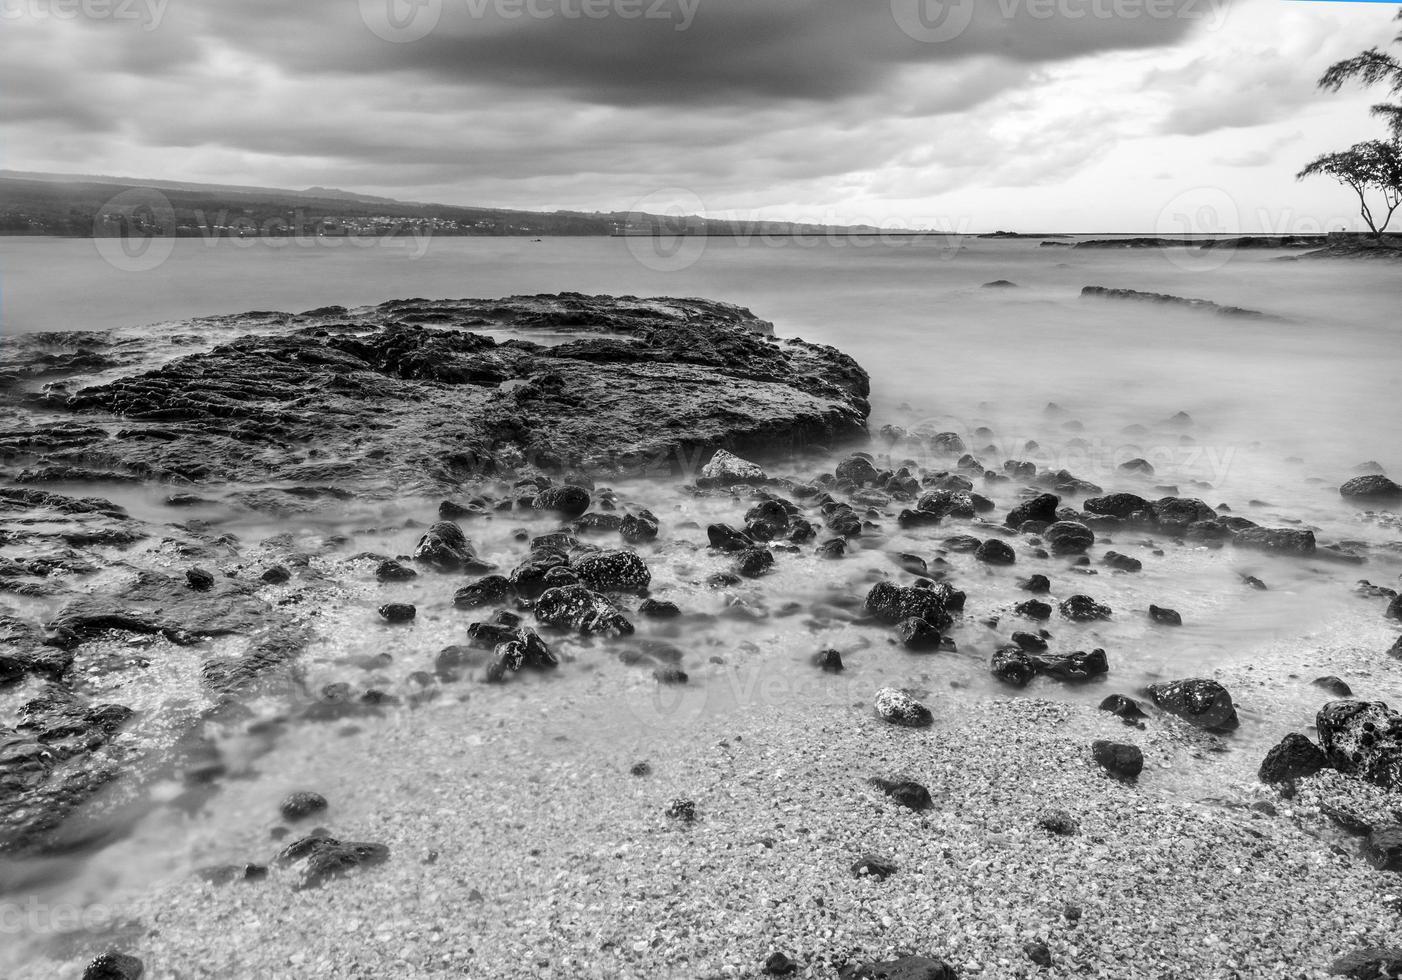 stor ö, hawaii kustlinje i svartvitt foto